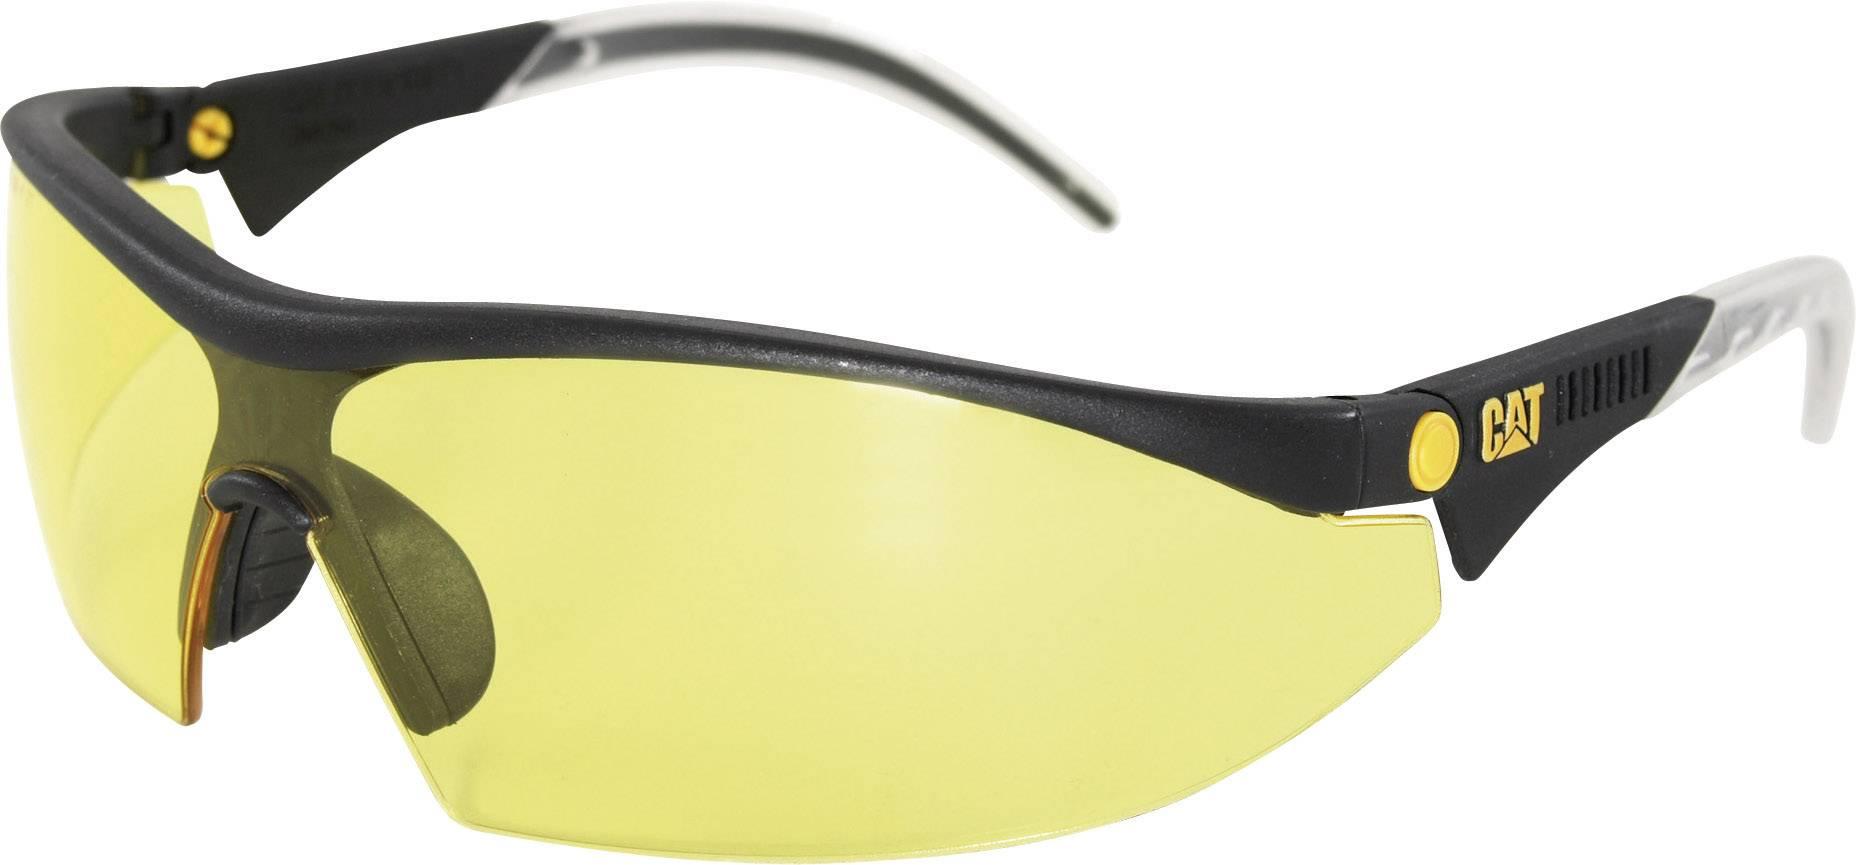 Ochranné okuliare CAT DIGGER112CATERPILLAR